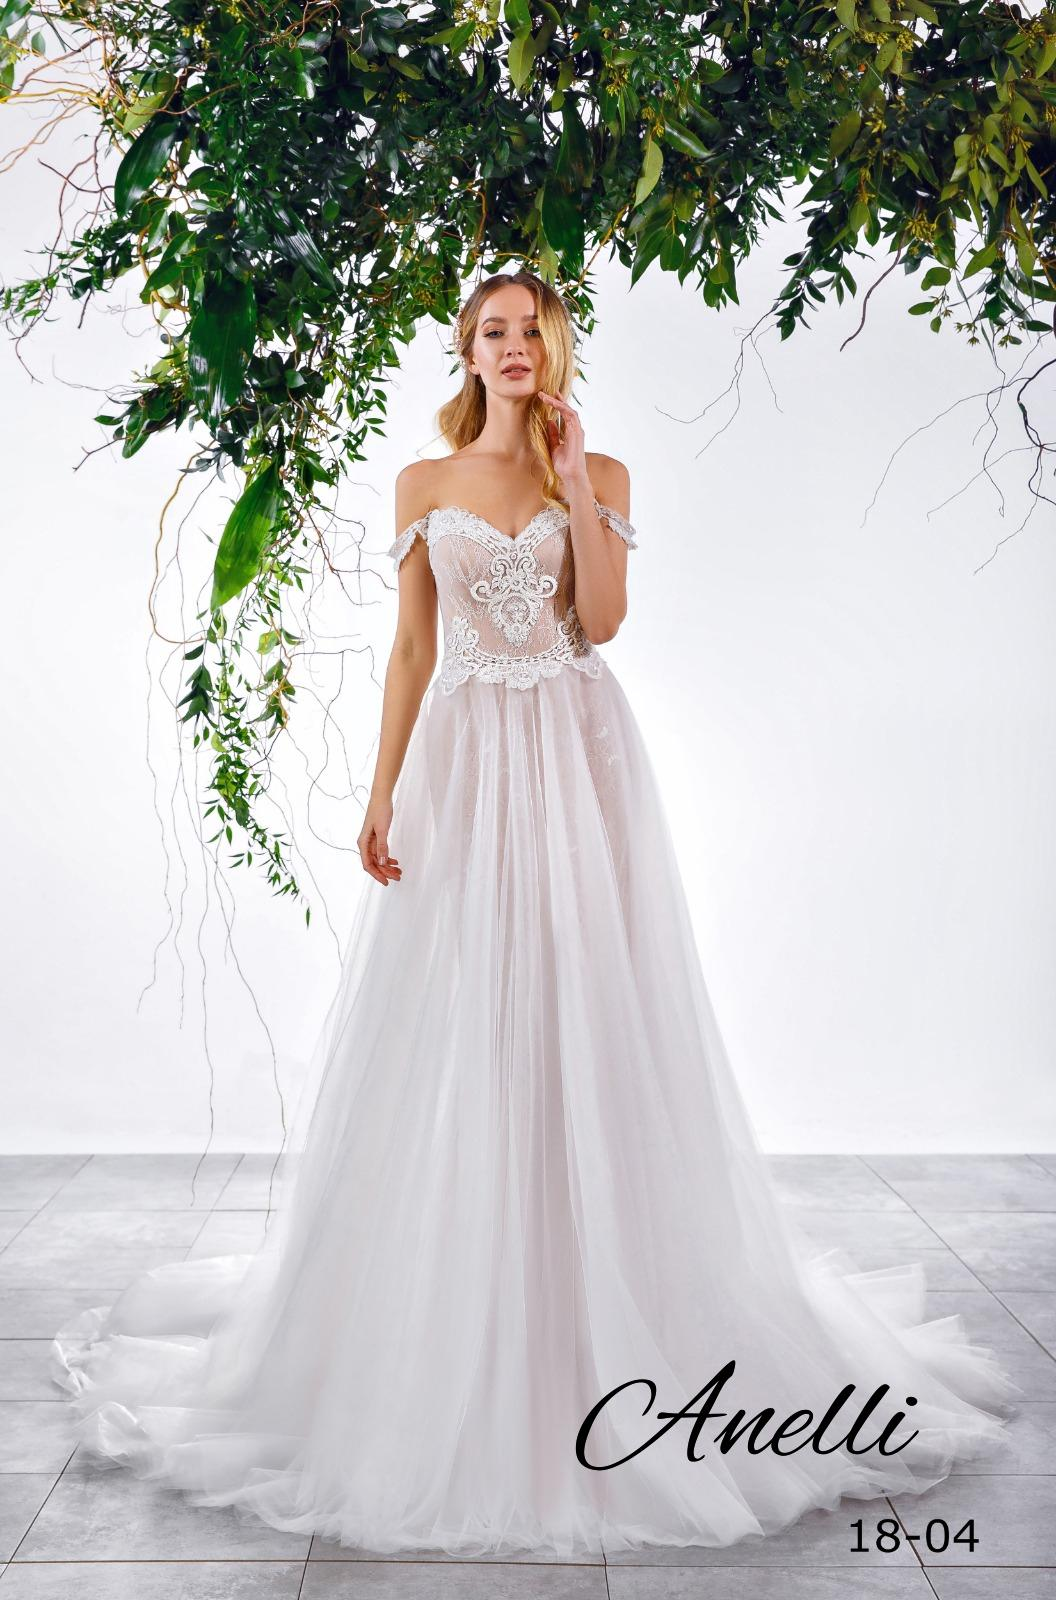 Svadobné šaty - Floral 1804 - Obrázok č. 1